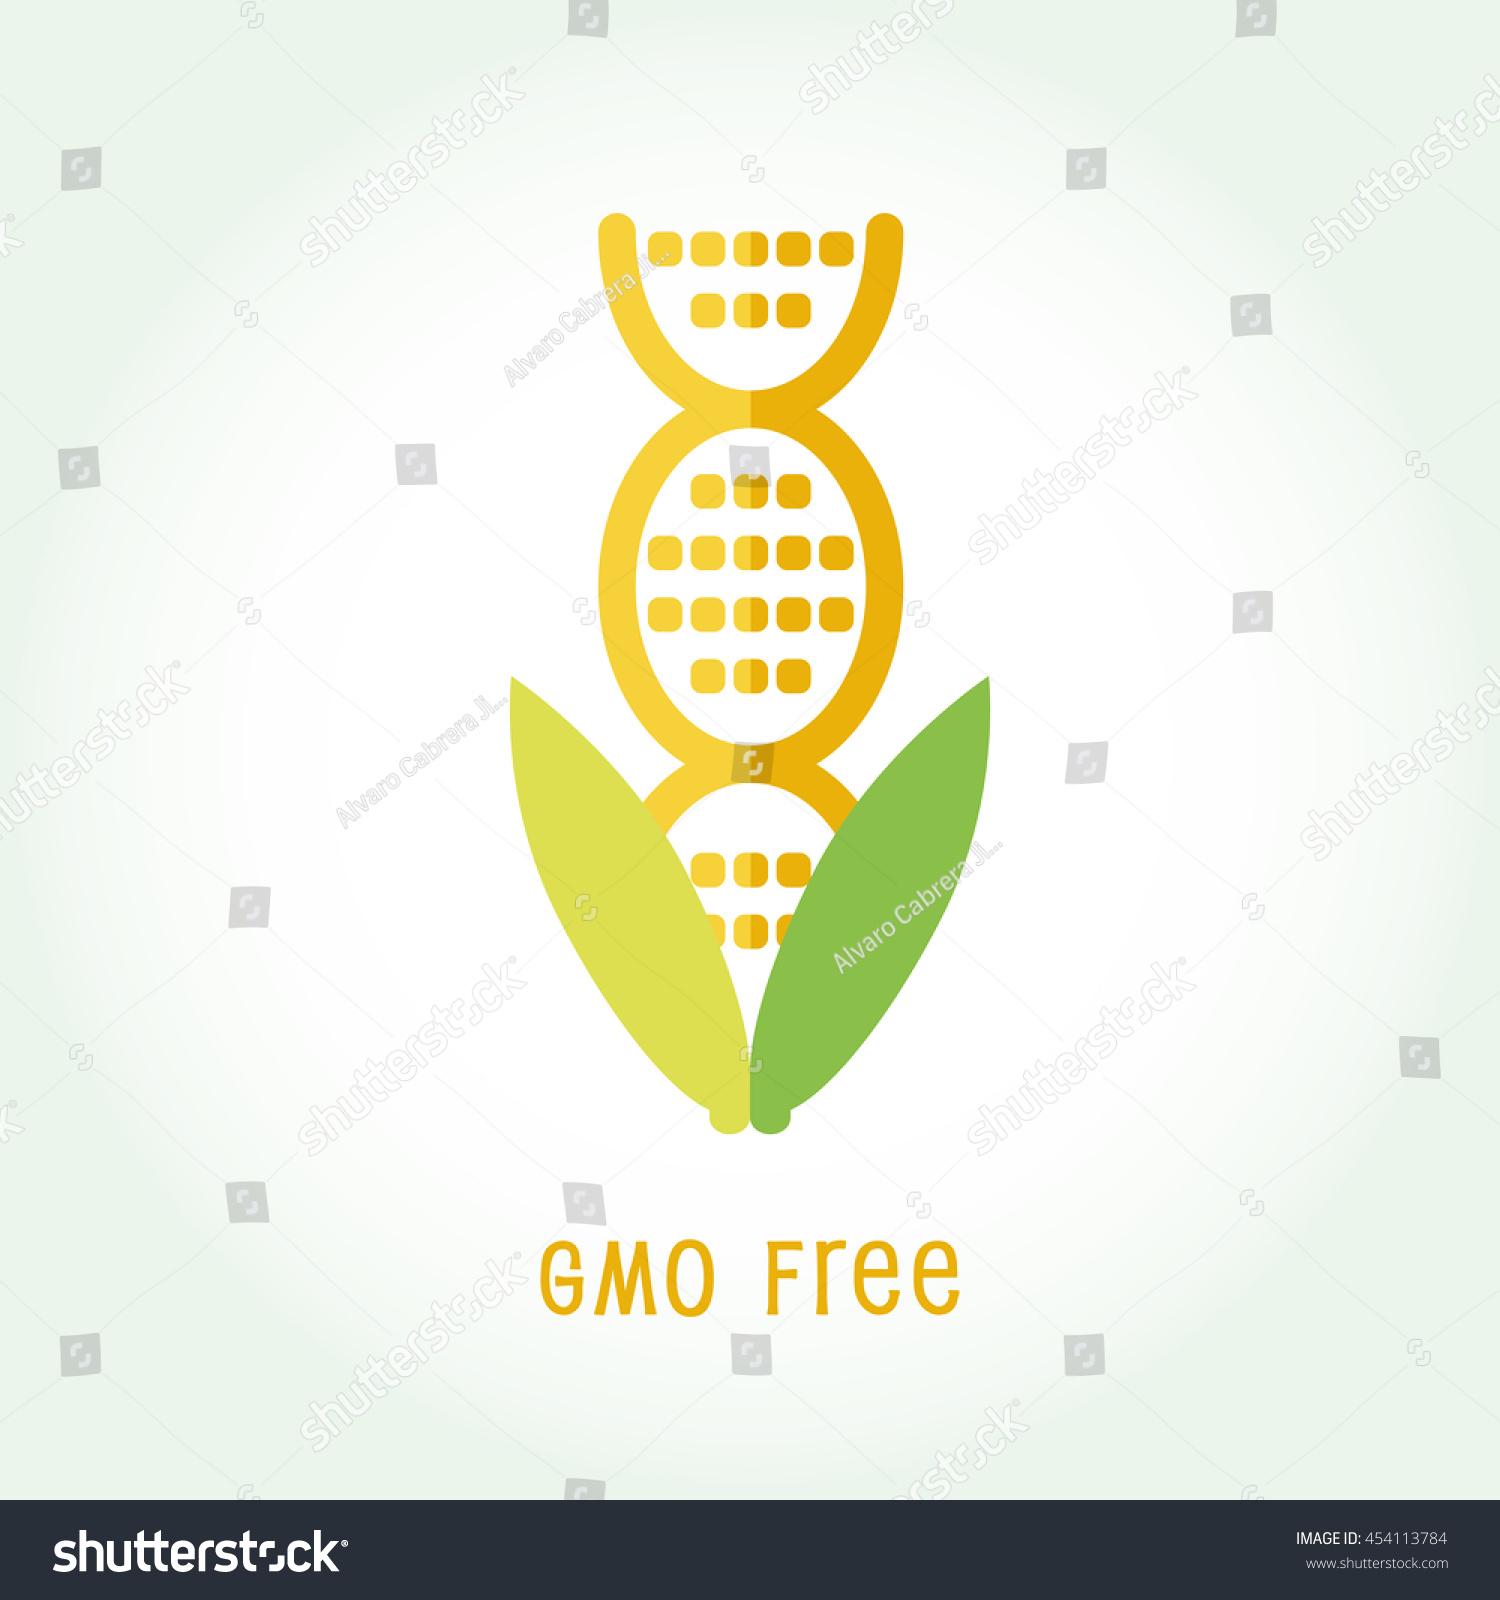 Gmo free icon symbol design non stock vector 454113784 shutterstock gmo free icon symbol design non genetically modified organism sign with cob corn vector illustration buycottarizona Images